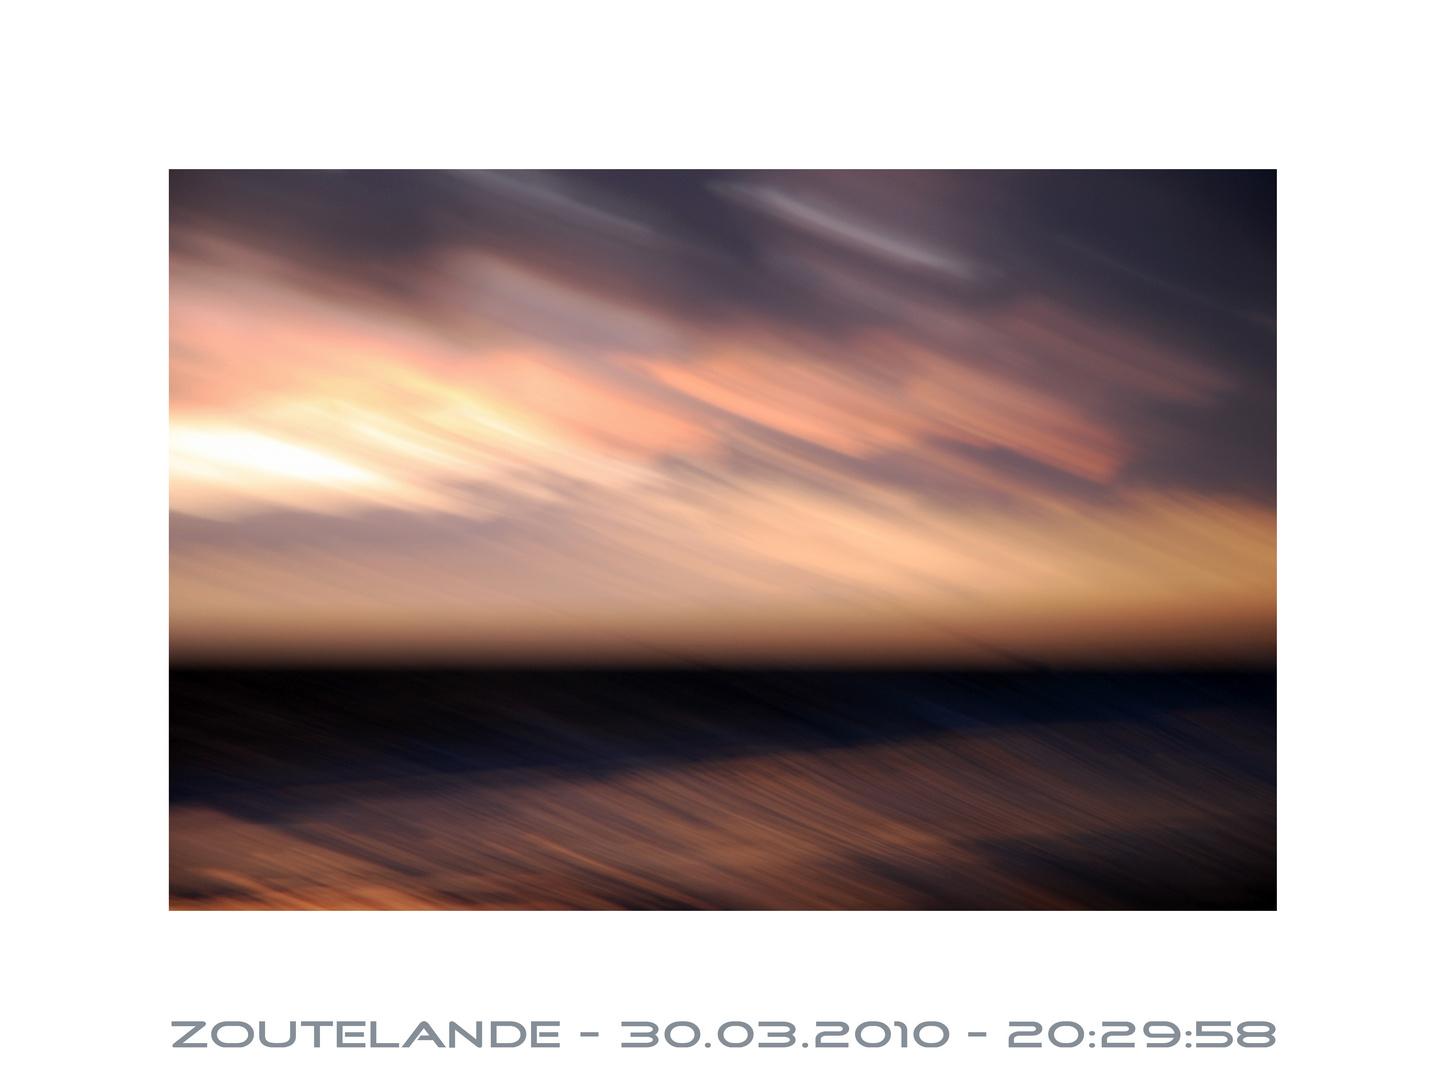 zoutelande - 30.03.2010 - 20:29:58